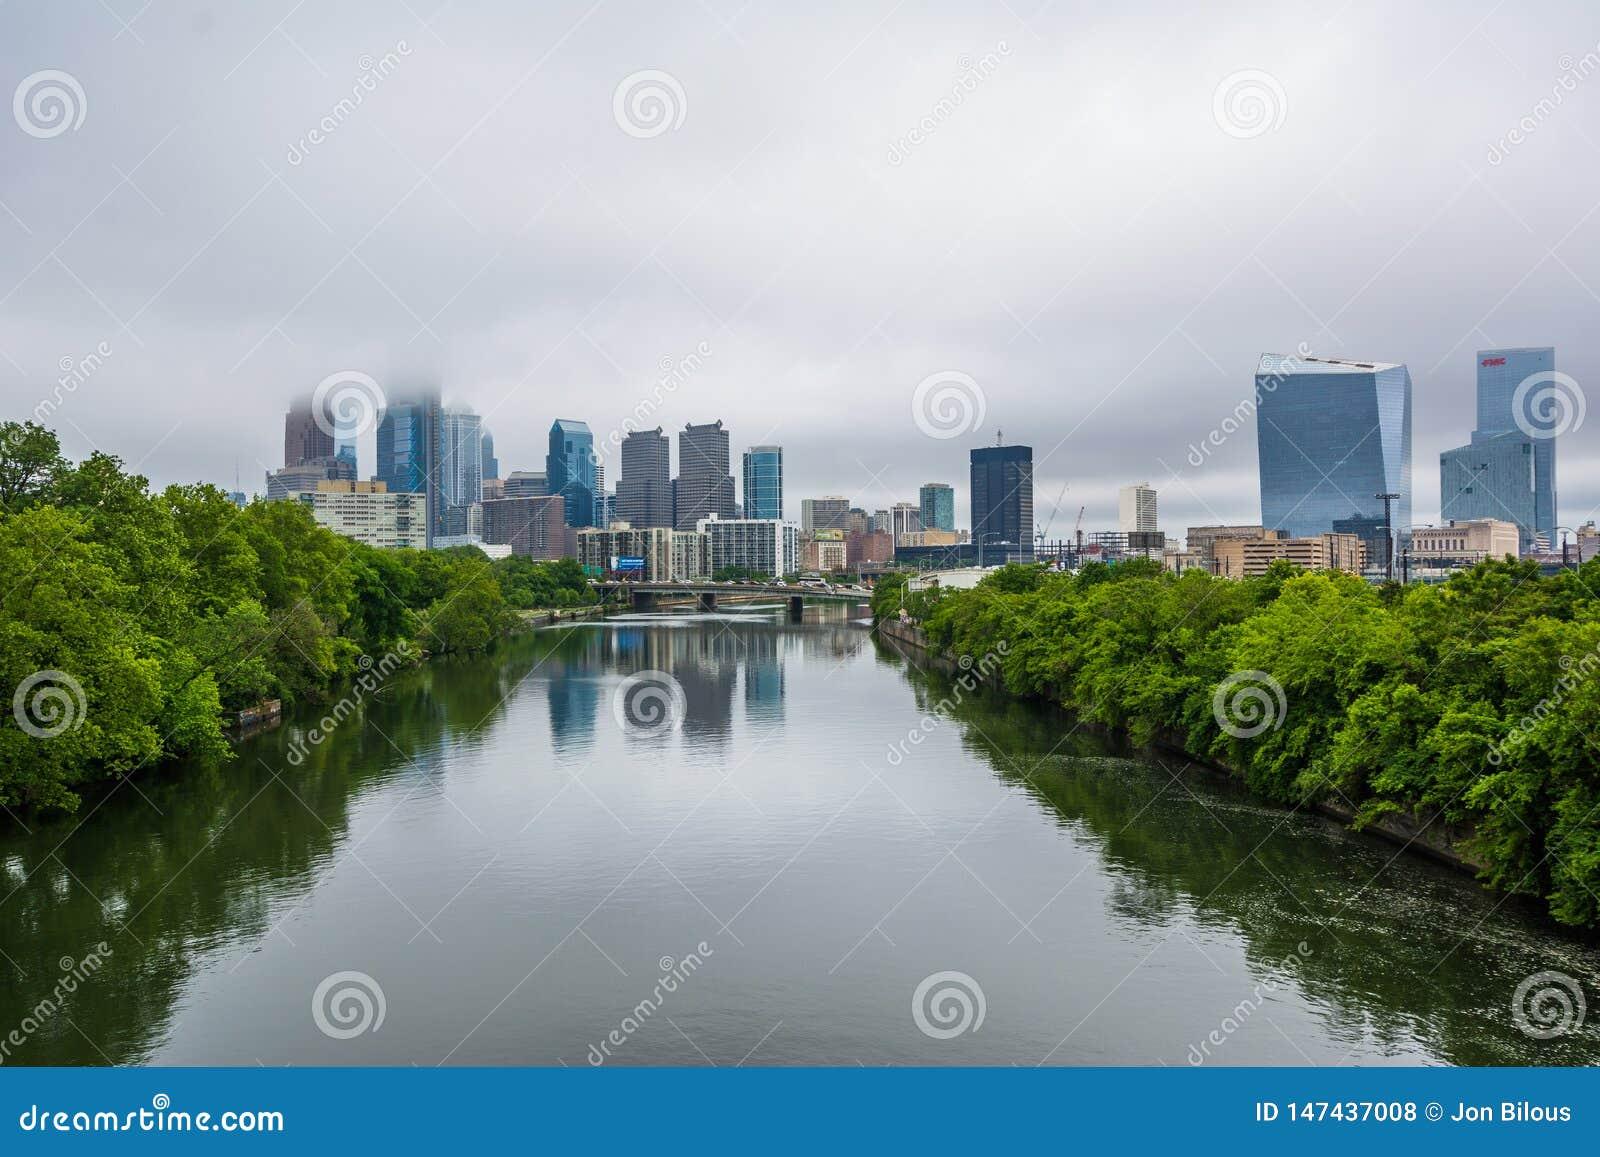 Foggy view of the Philadelphia skyline and Schuylkill River in Philadelphia, Pennsylvania